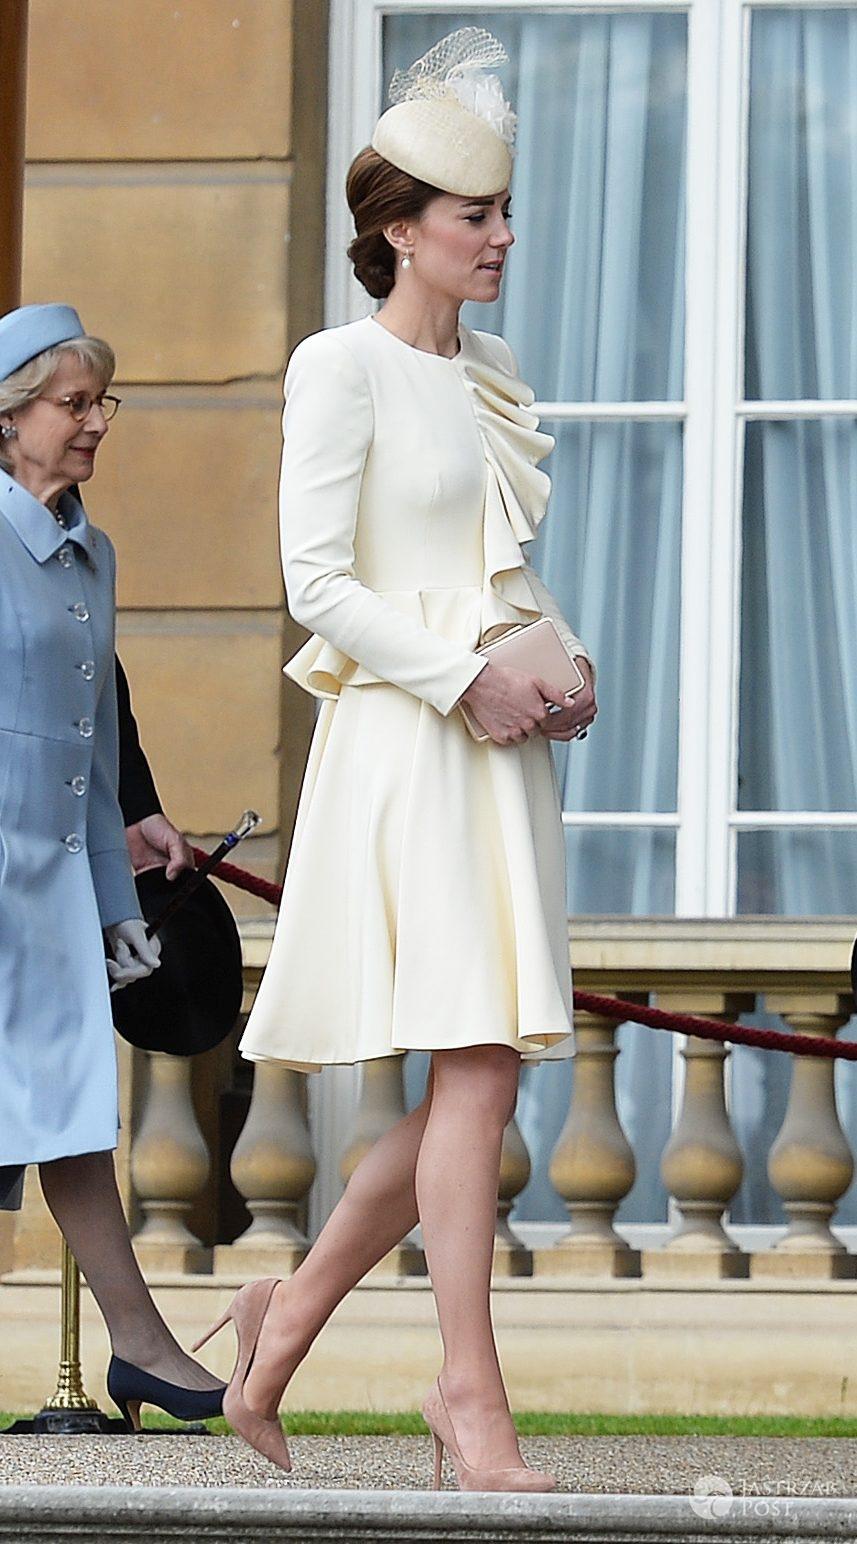 Kreacja: Alexander McQueen. Księżna Kate na garden party w Pałacu Buckingham (fot. ONS)